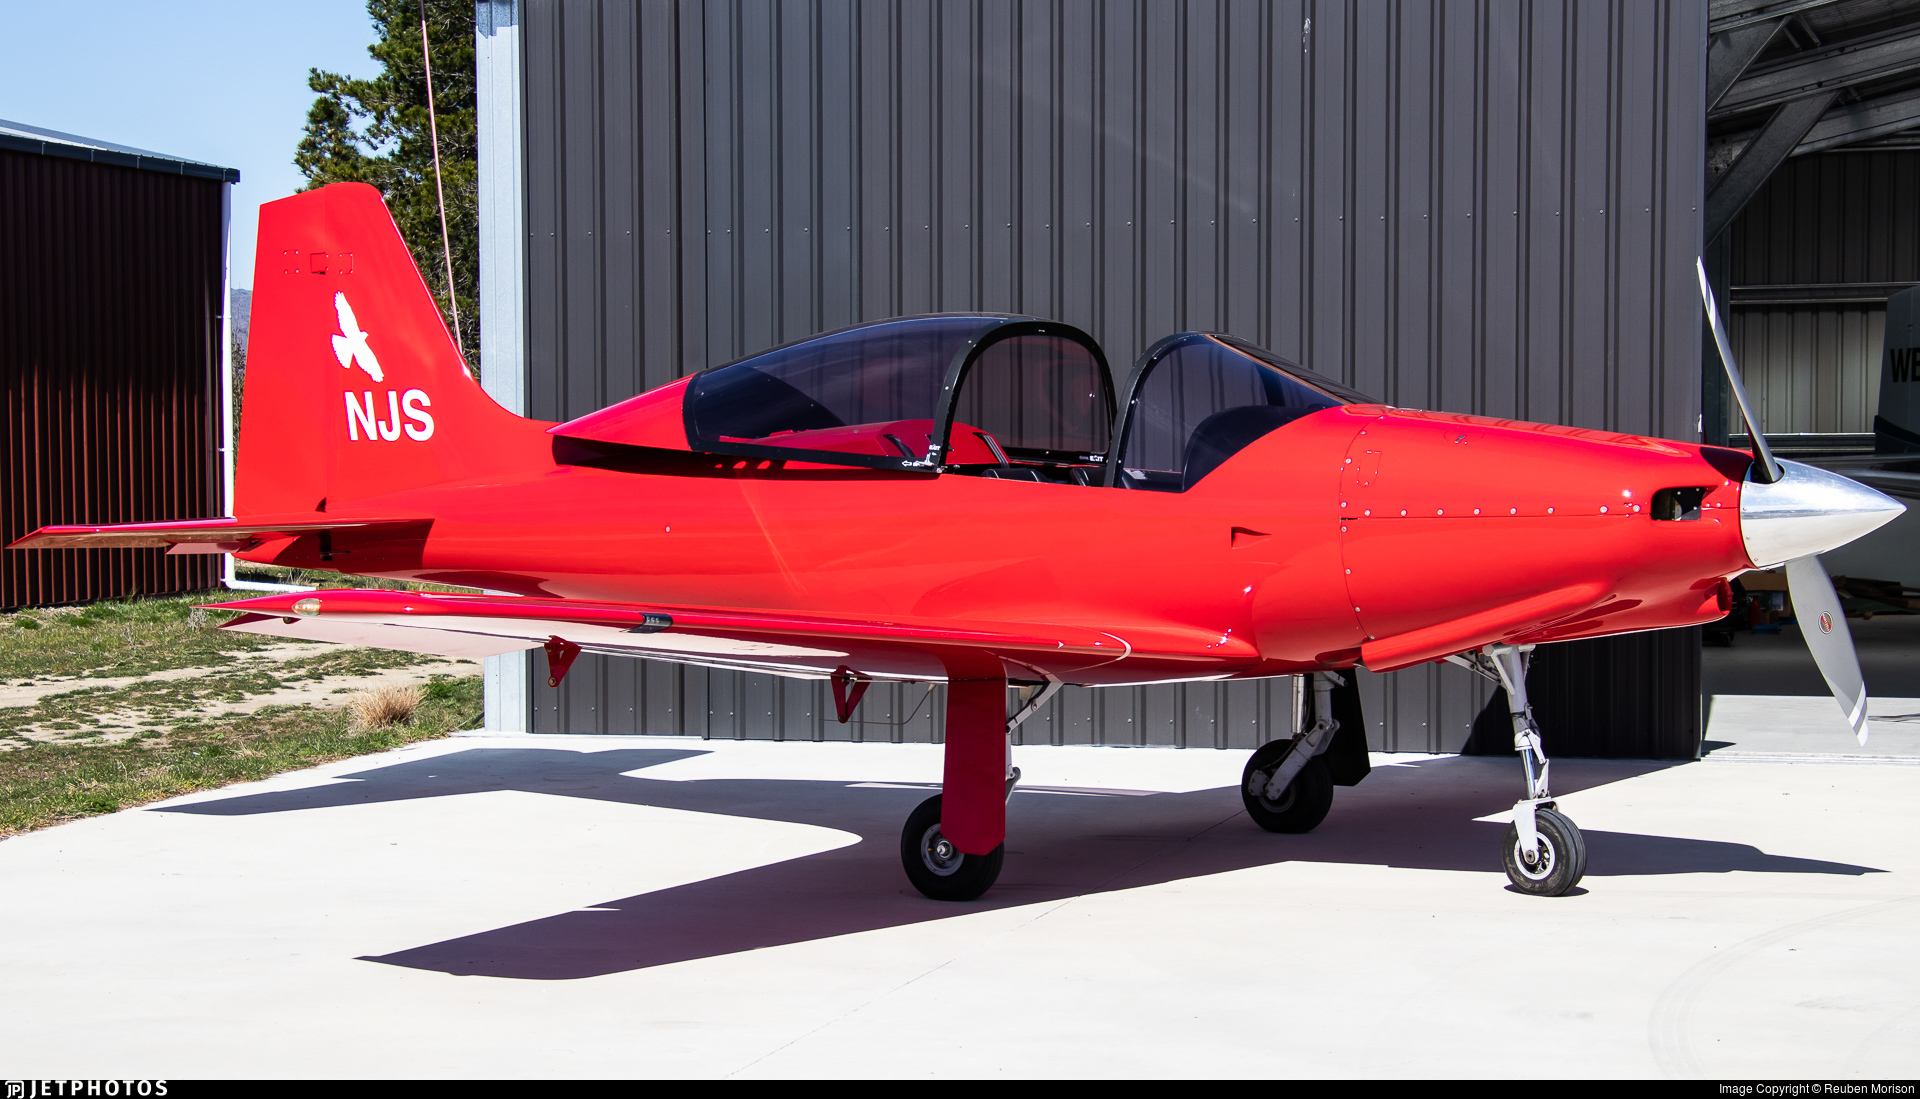 ZK-NJS - Falcomposite Furio LN27 RG - Private